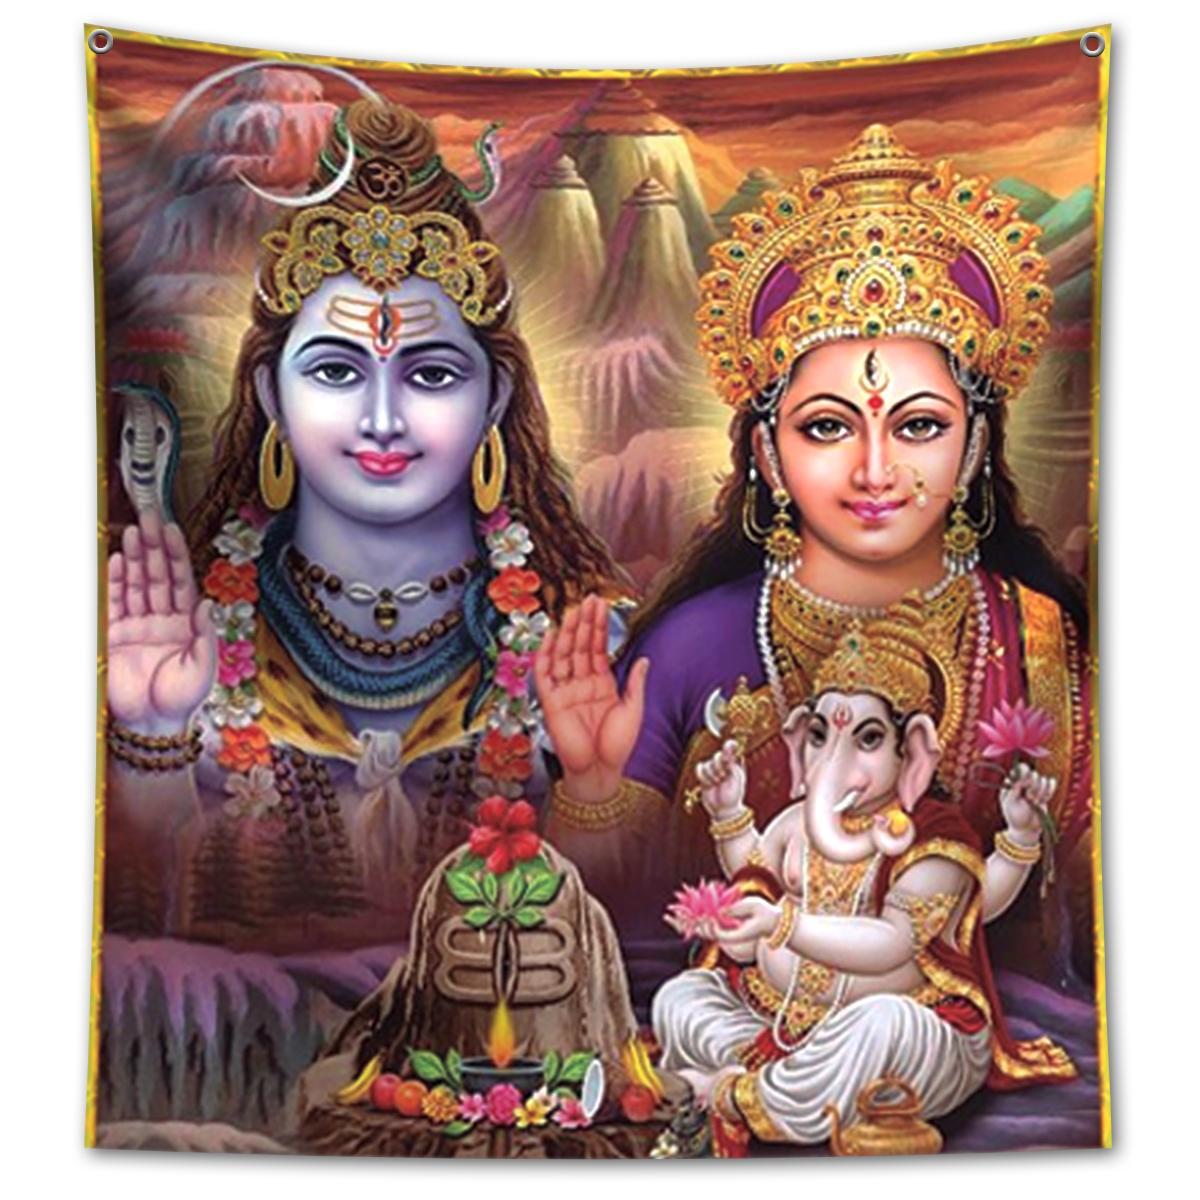 Panô Decorativo Trindade Hindu - Banner